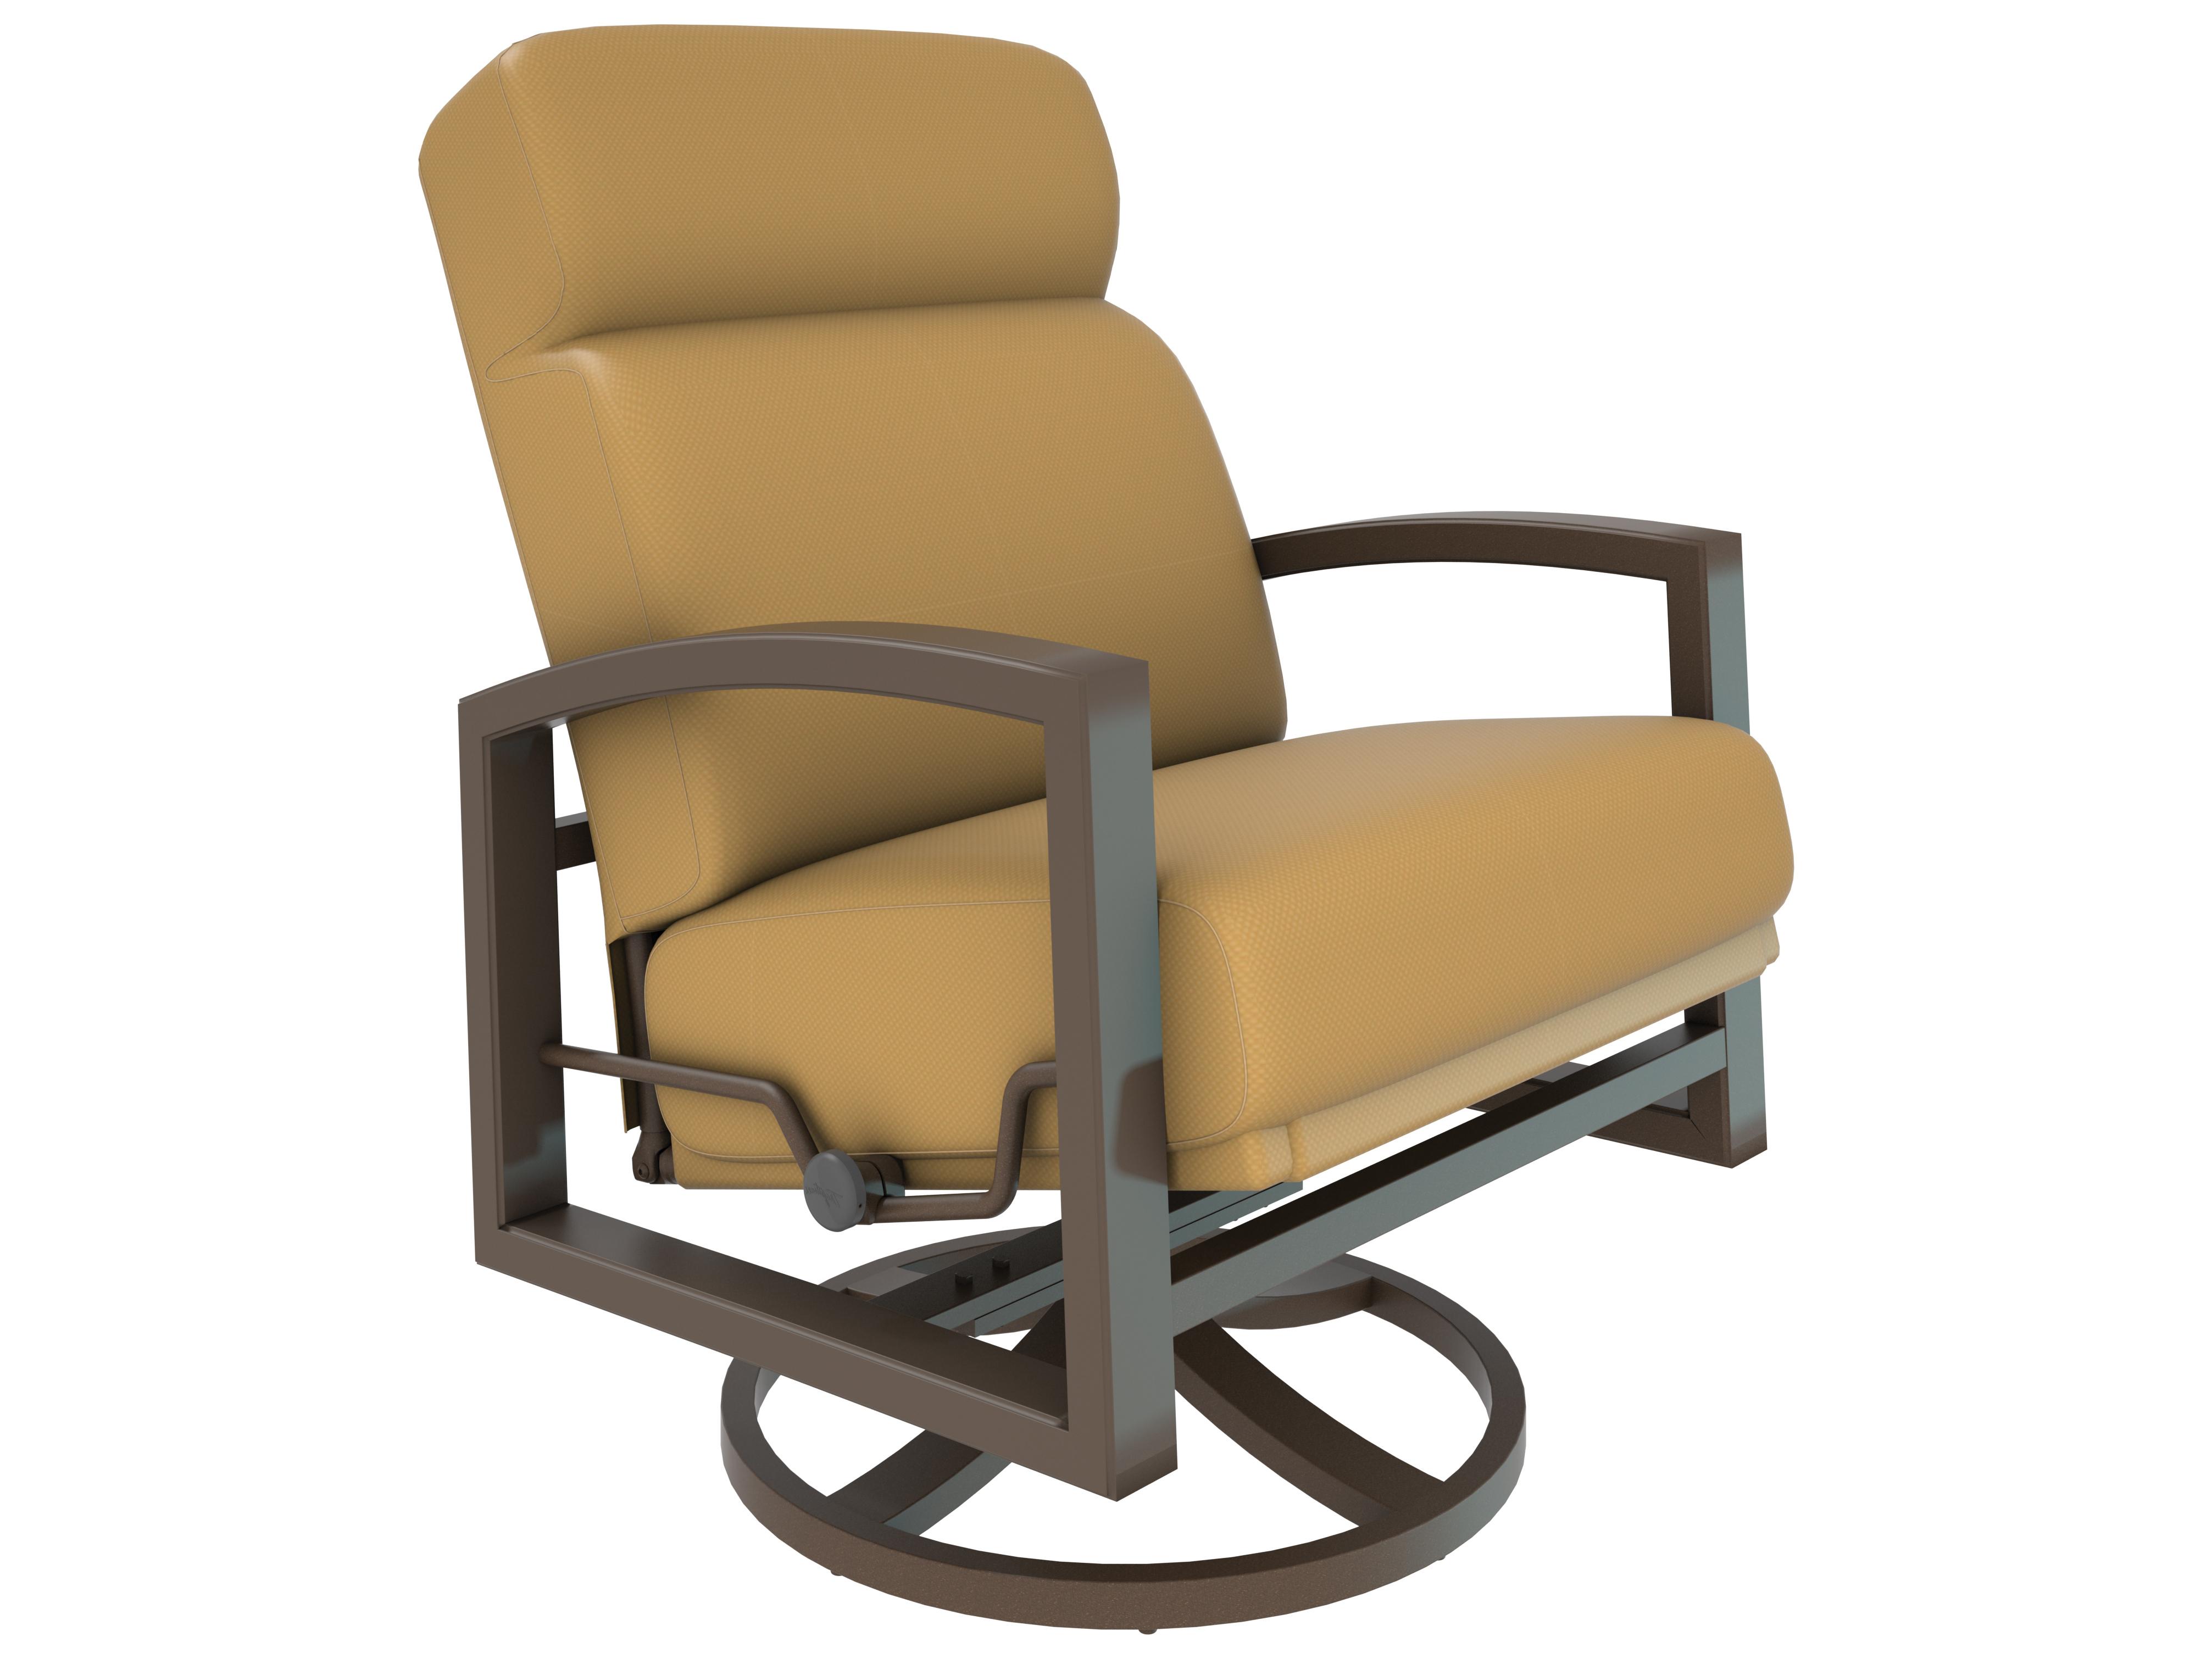 Tropitone Lakeside Urcomfort Cushion Aluminum Swivel